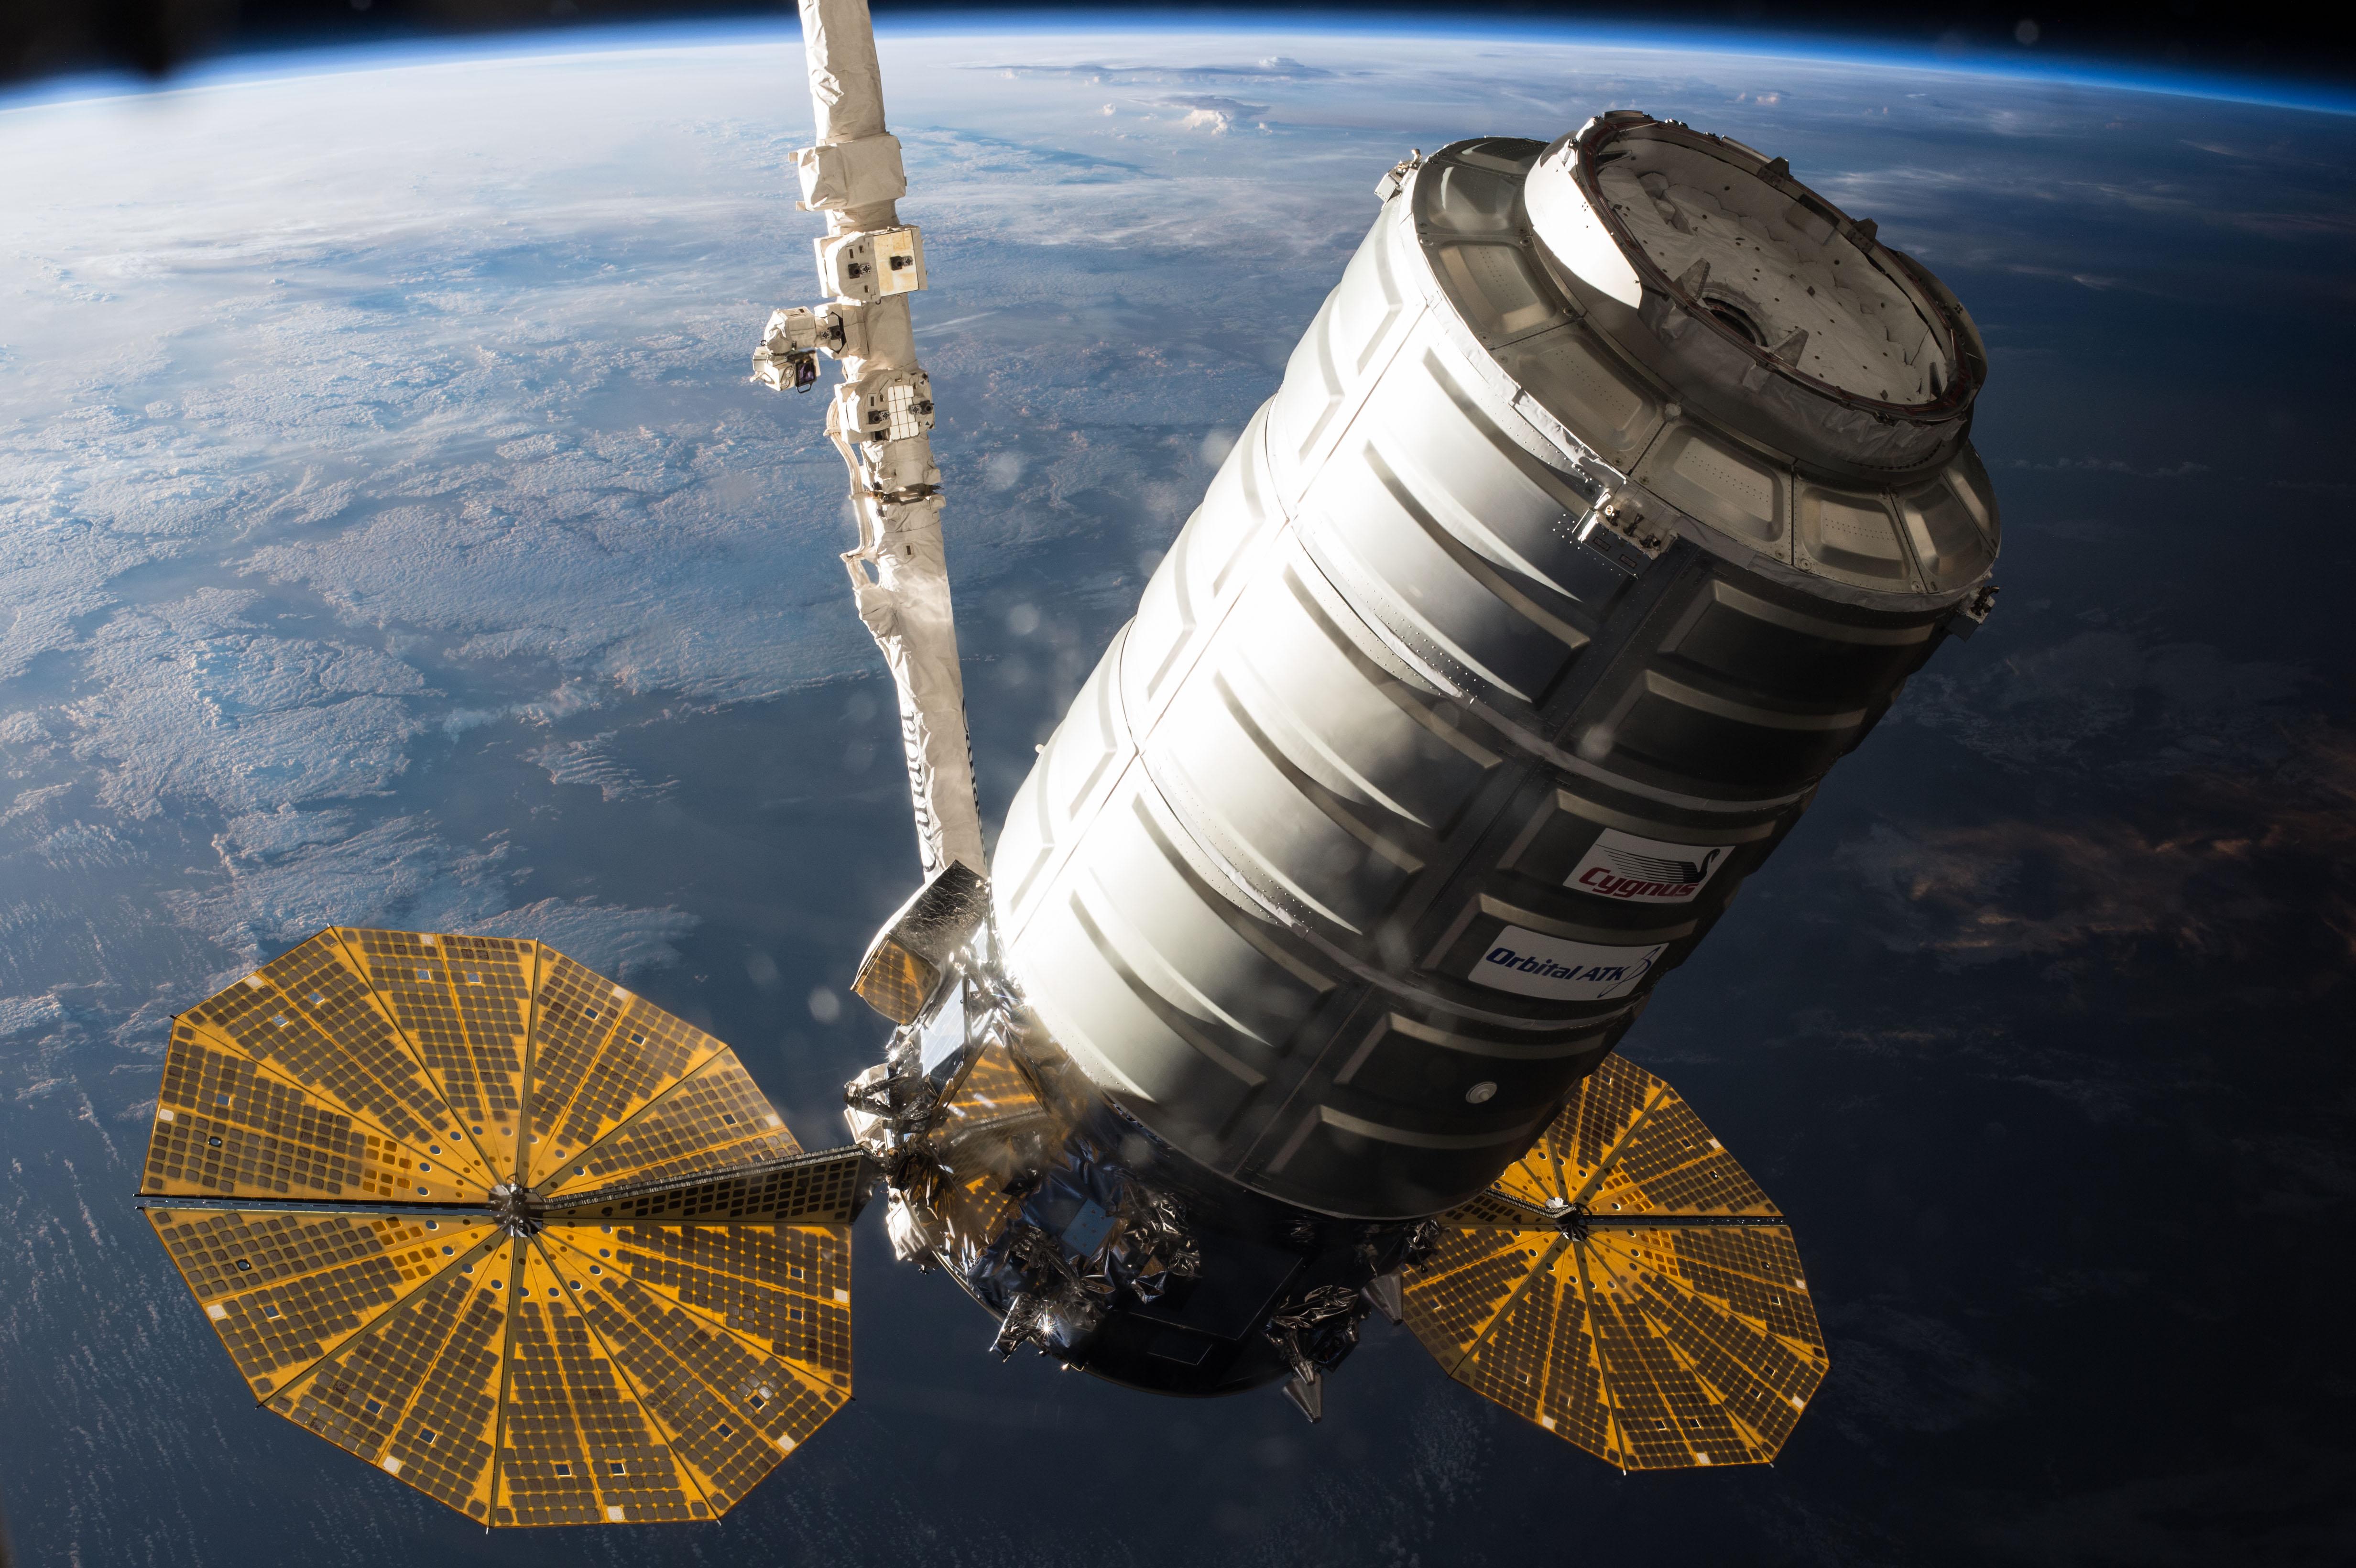 Cygnus Set To Depart ISS For Week-Long Free Flight & In